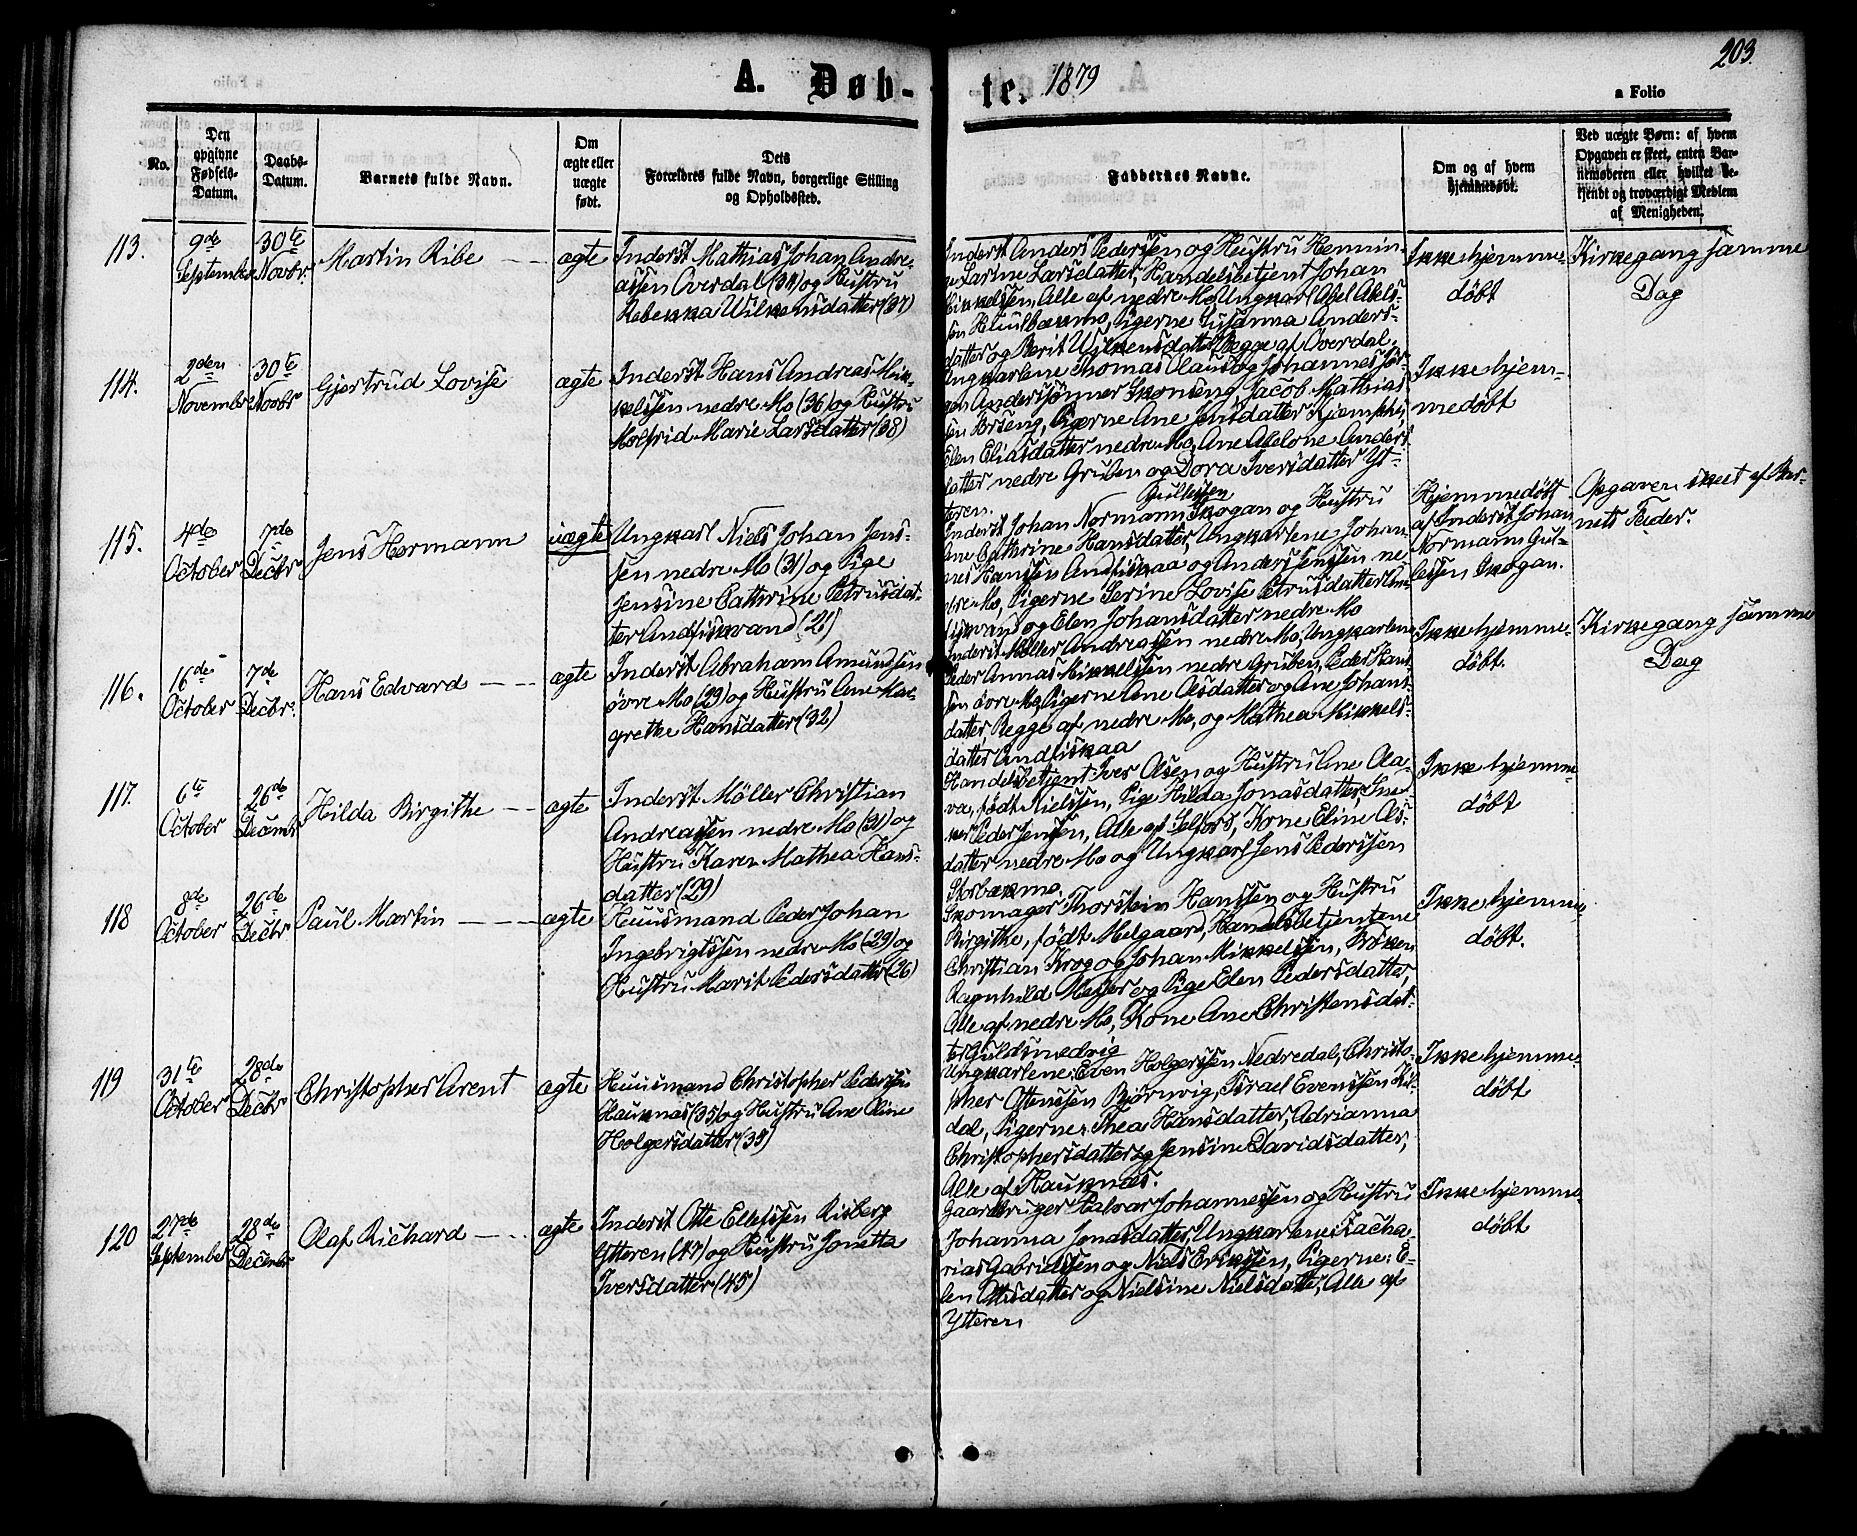 SAT, Ministerialprotokoller, klokkerbøker og fødselsregistre - Nordland, 827/L0393: Ministerialbok nr. 827A05, 1863-1883, s. 203